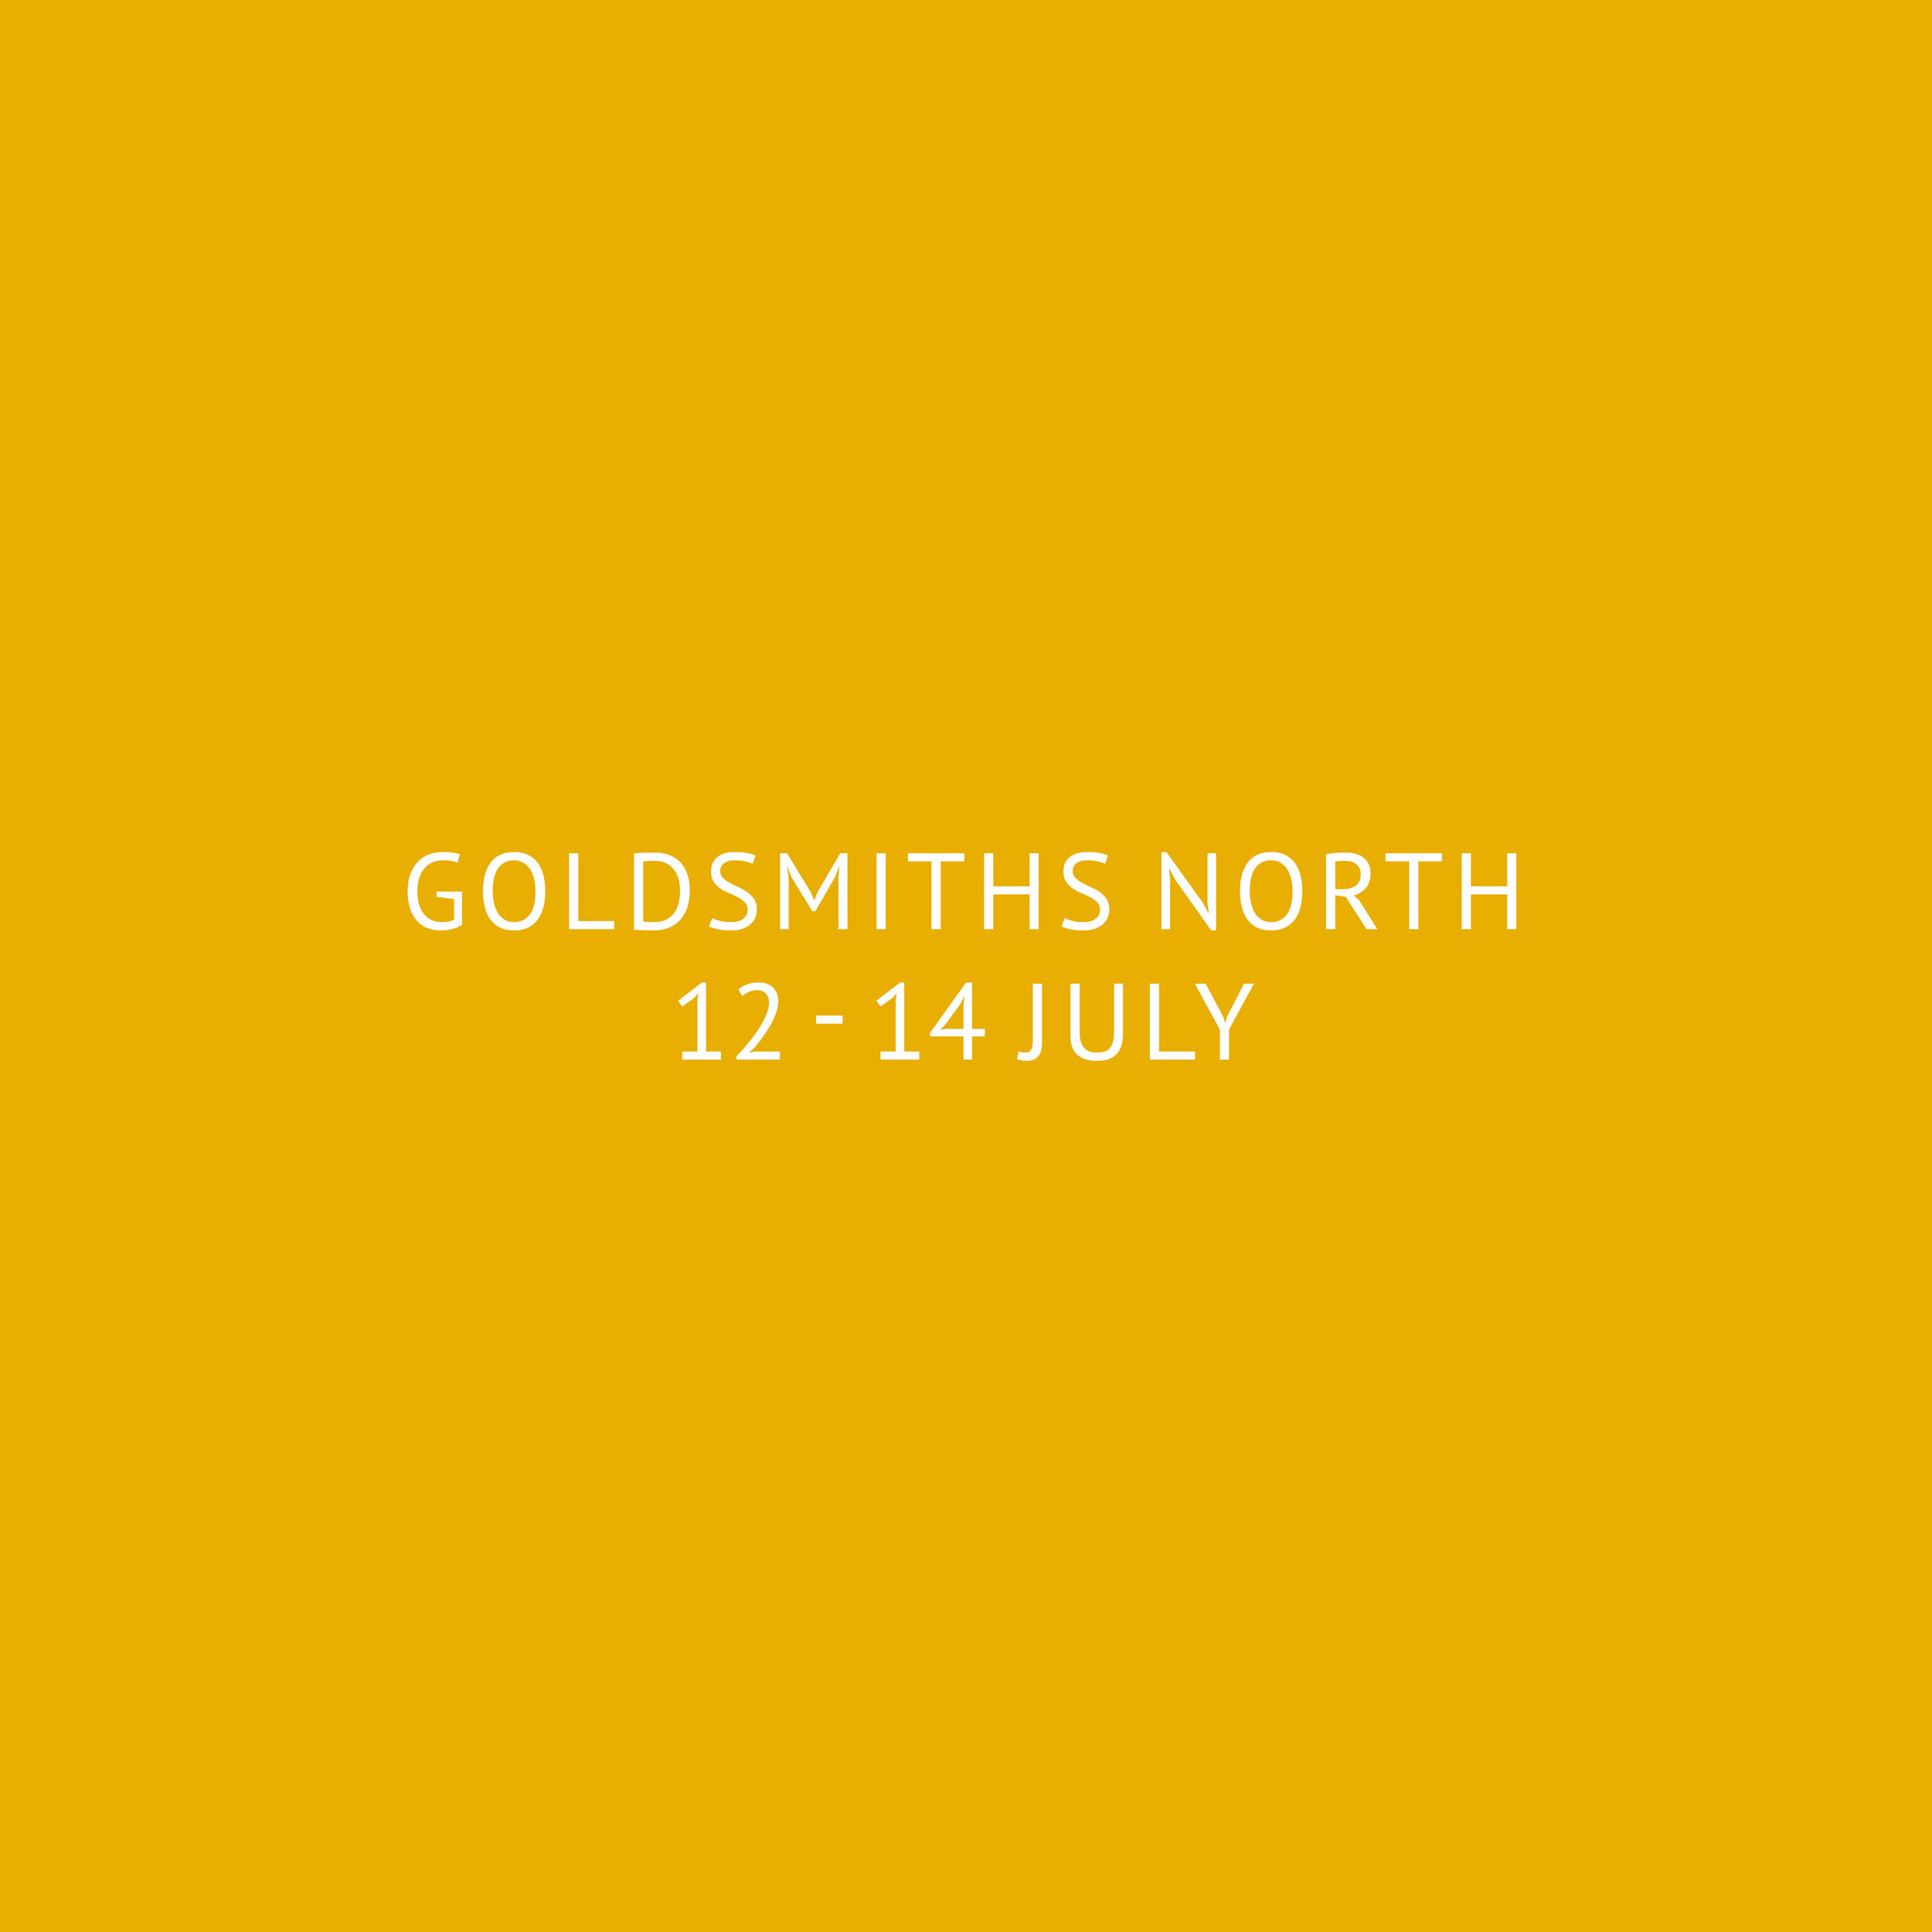 Goldsmiths north 2019 .jpg